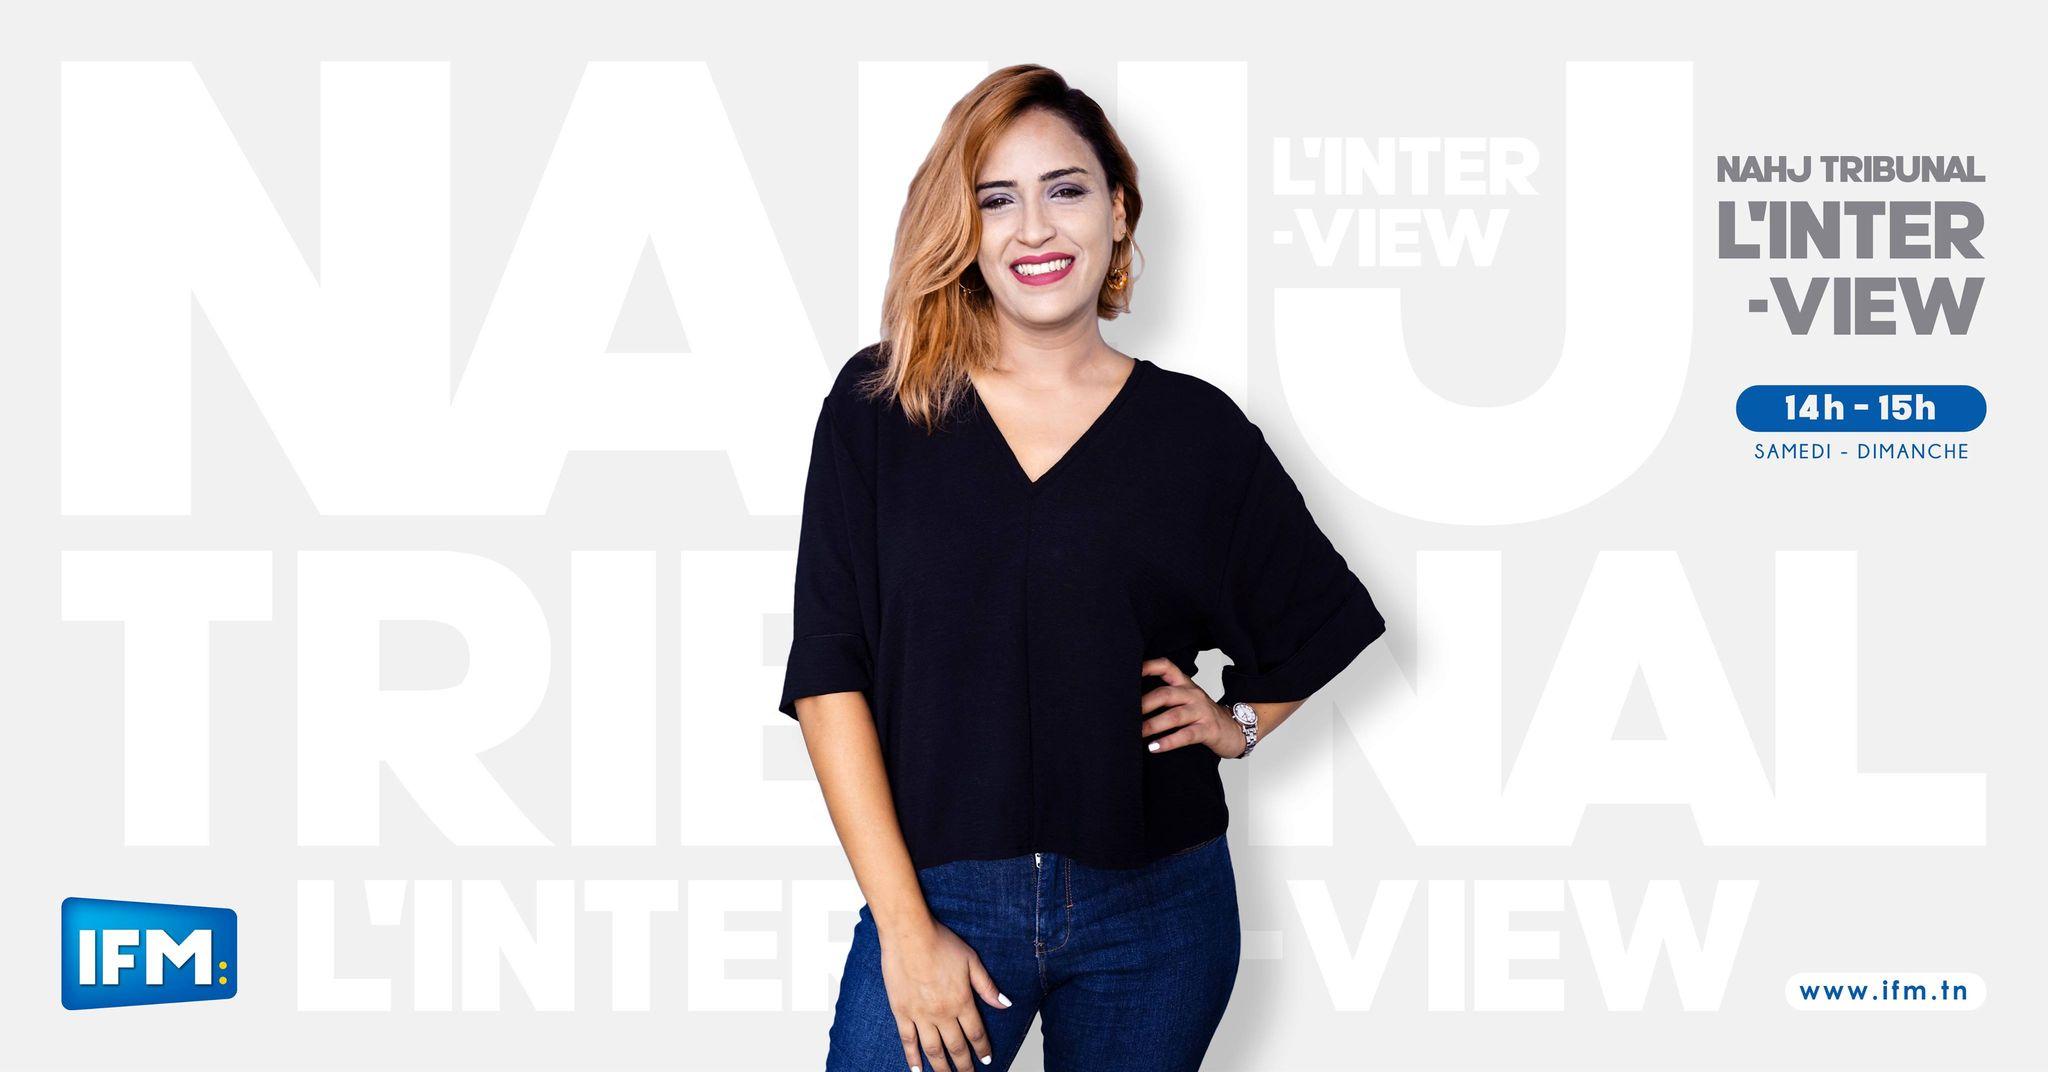 نهج تريبونال L'interview